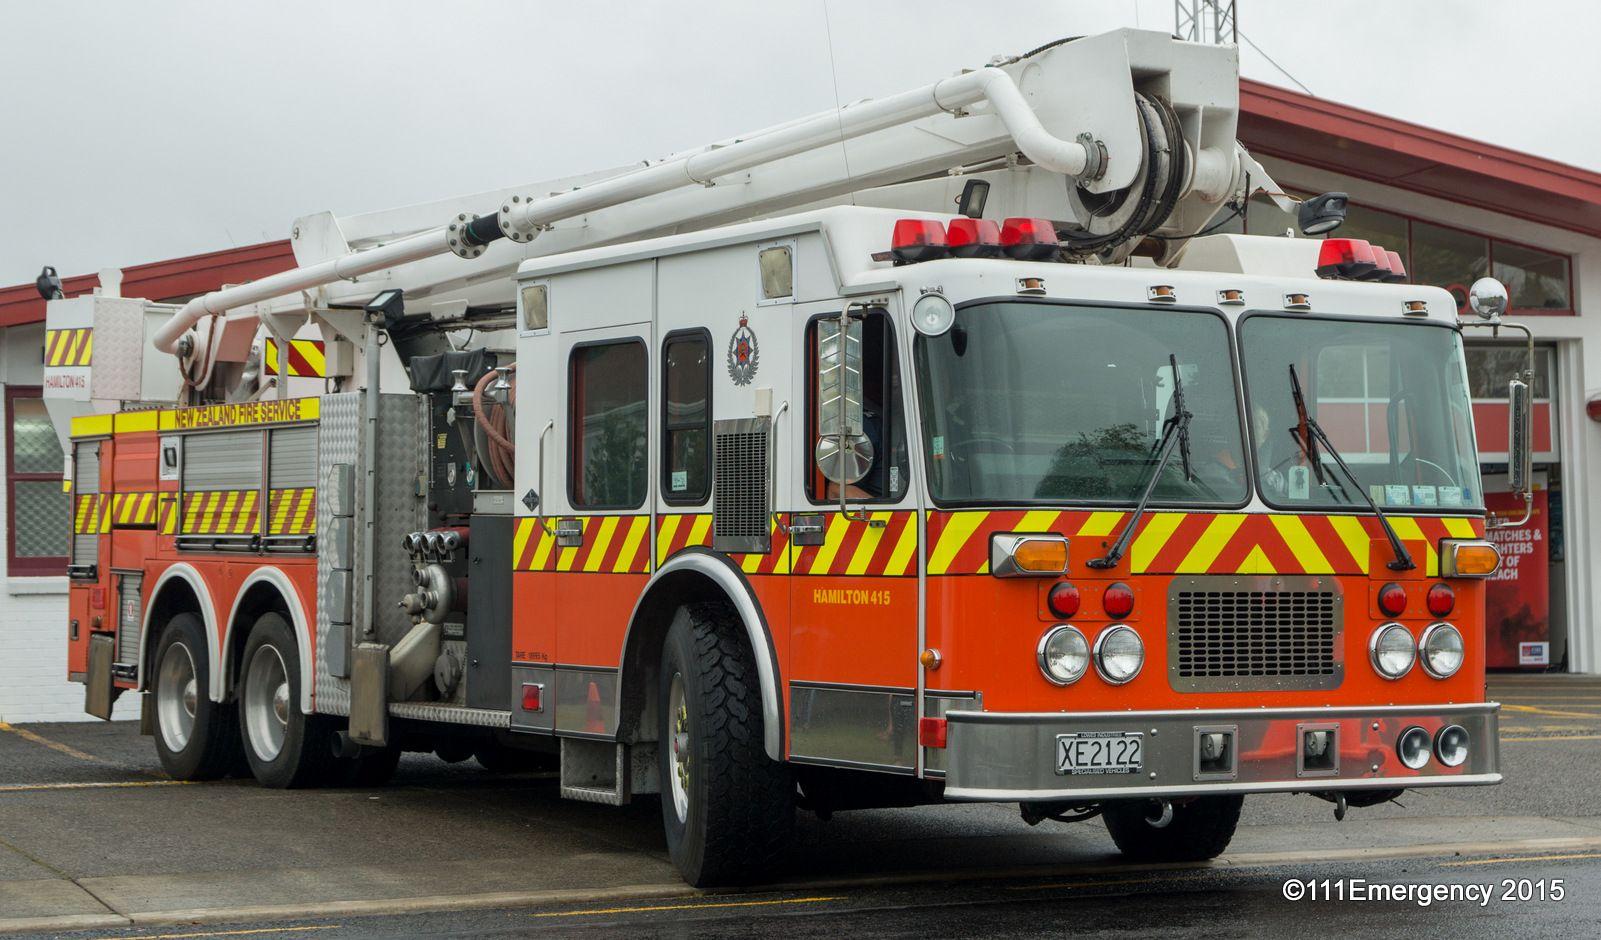 New zealand fire service hamilton 415 fire trucks fire